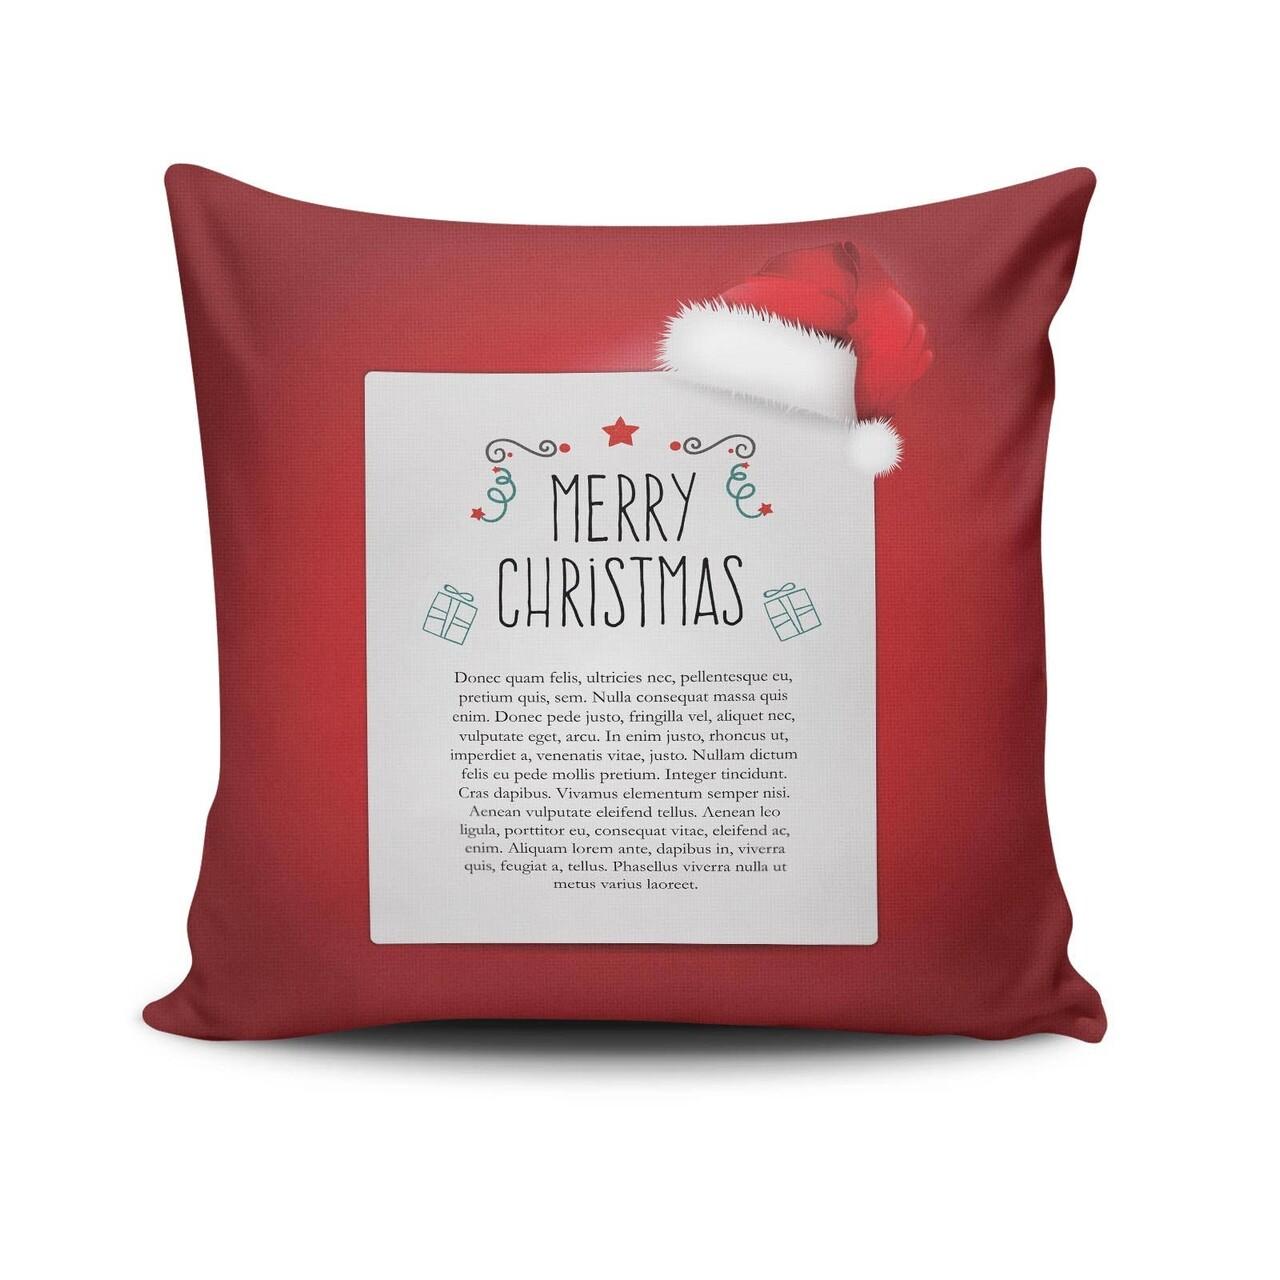 Perna decorativa, Christmas NOELKRLNT-12, 43x43 cm, policoton, multicolor